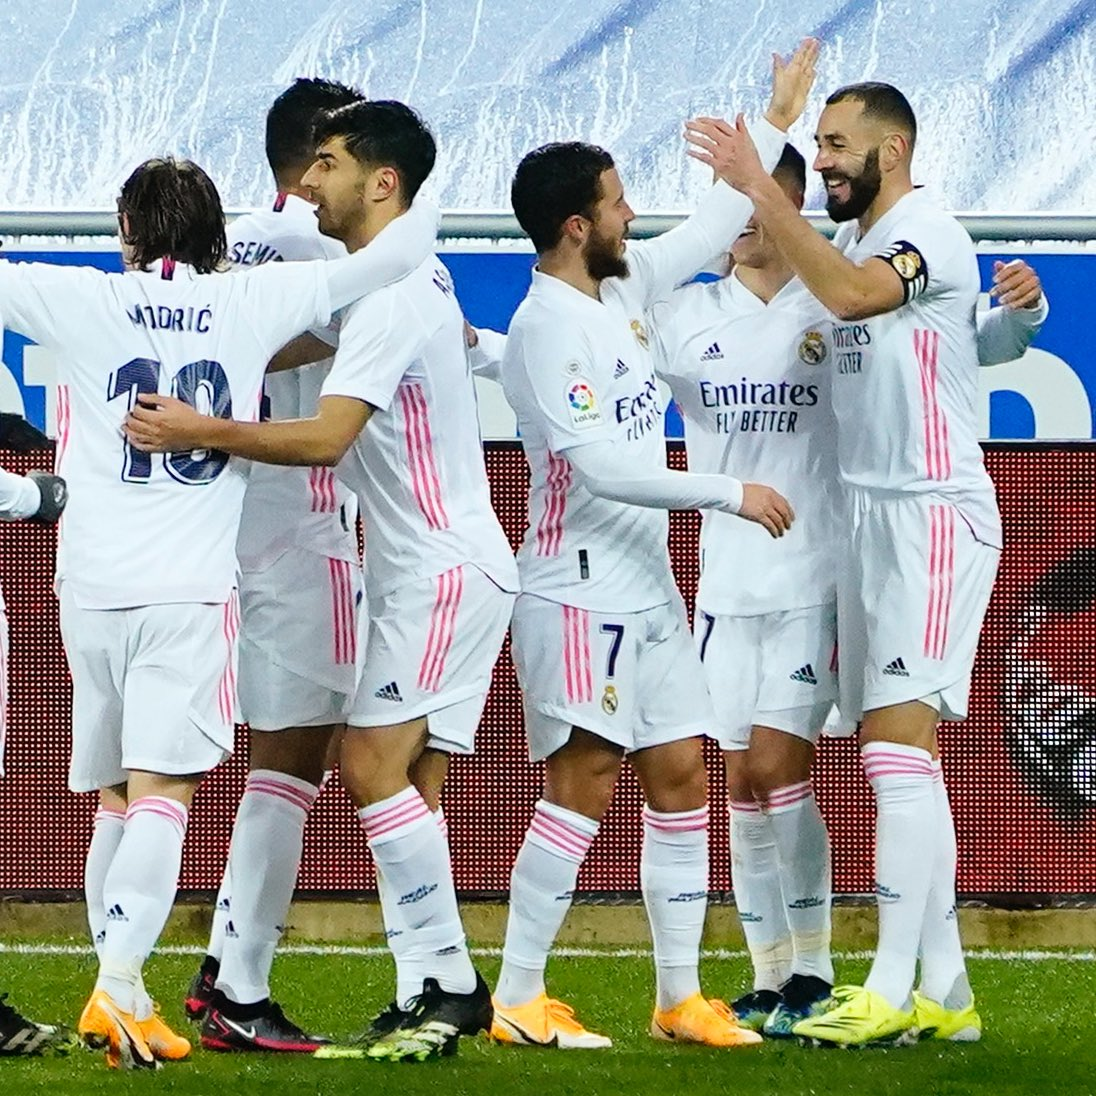 🔵Alaves 1 | 4 Real Madrid⚪️ Golazo & Doblete ⚽️⚽️ de Benzema 👏 #RMLiga #AlavesRealMadrid  #RMFans #realfootball #HalaMadrid